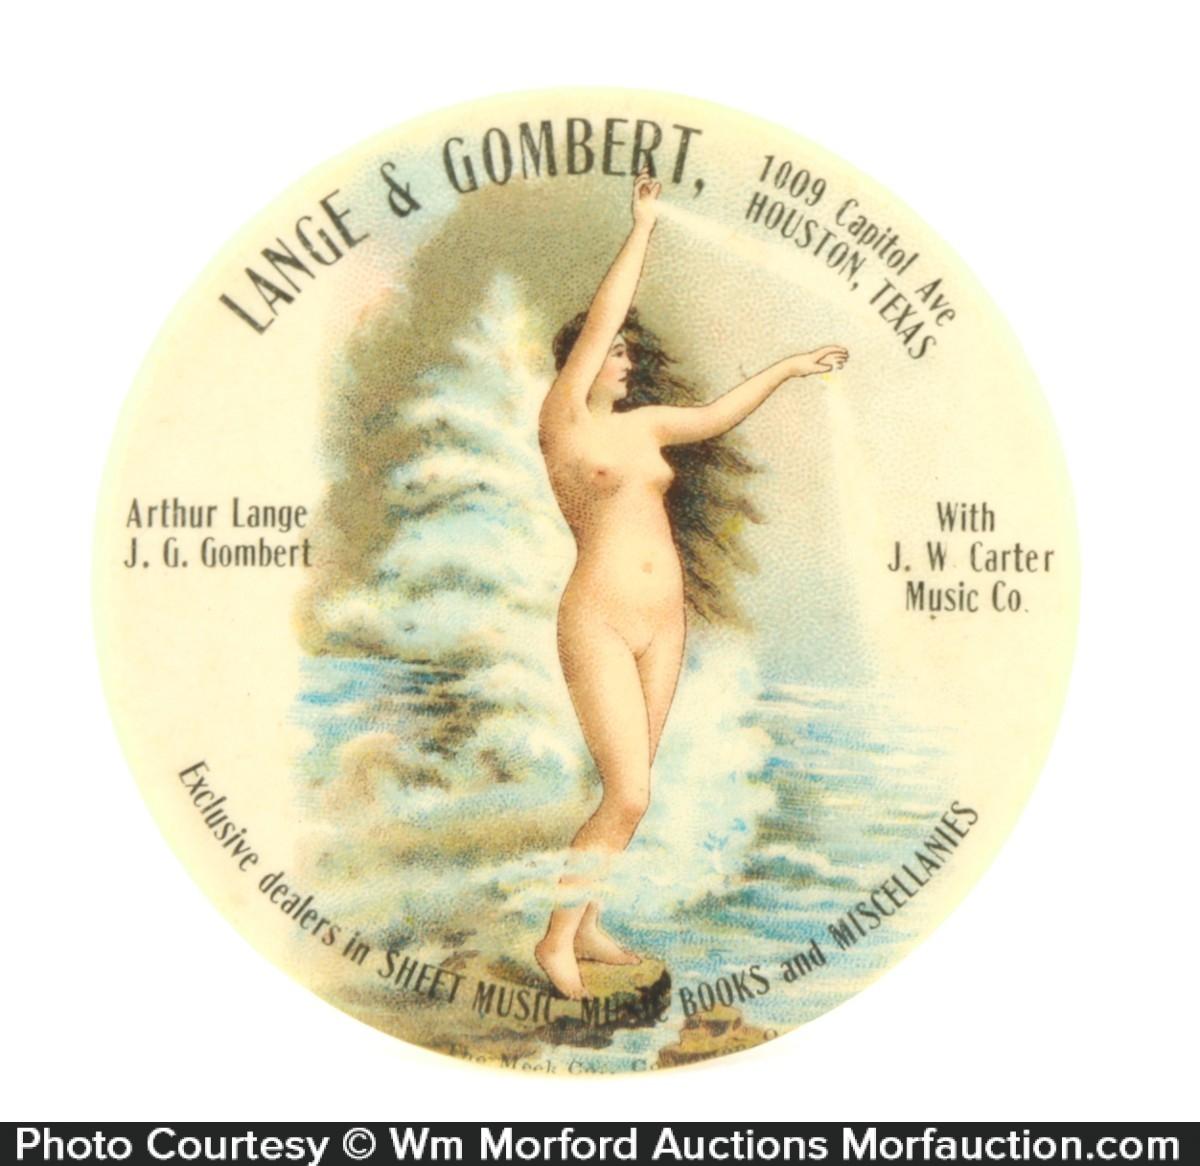 Lange & Gombert Music Pocket Mirror